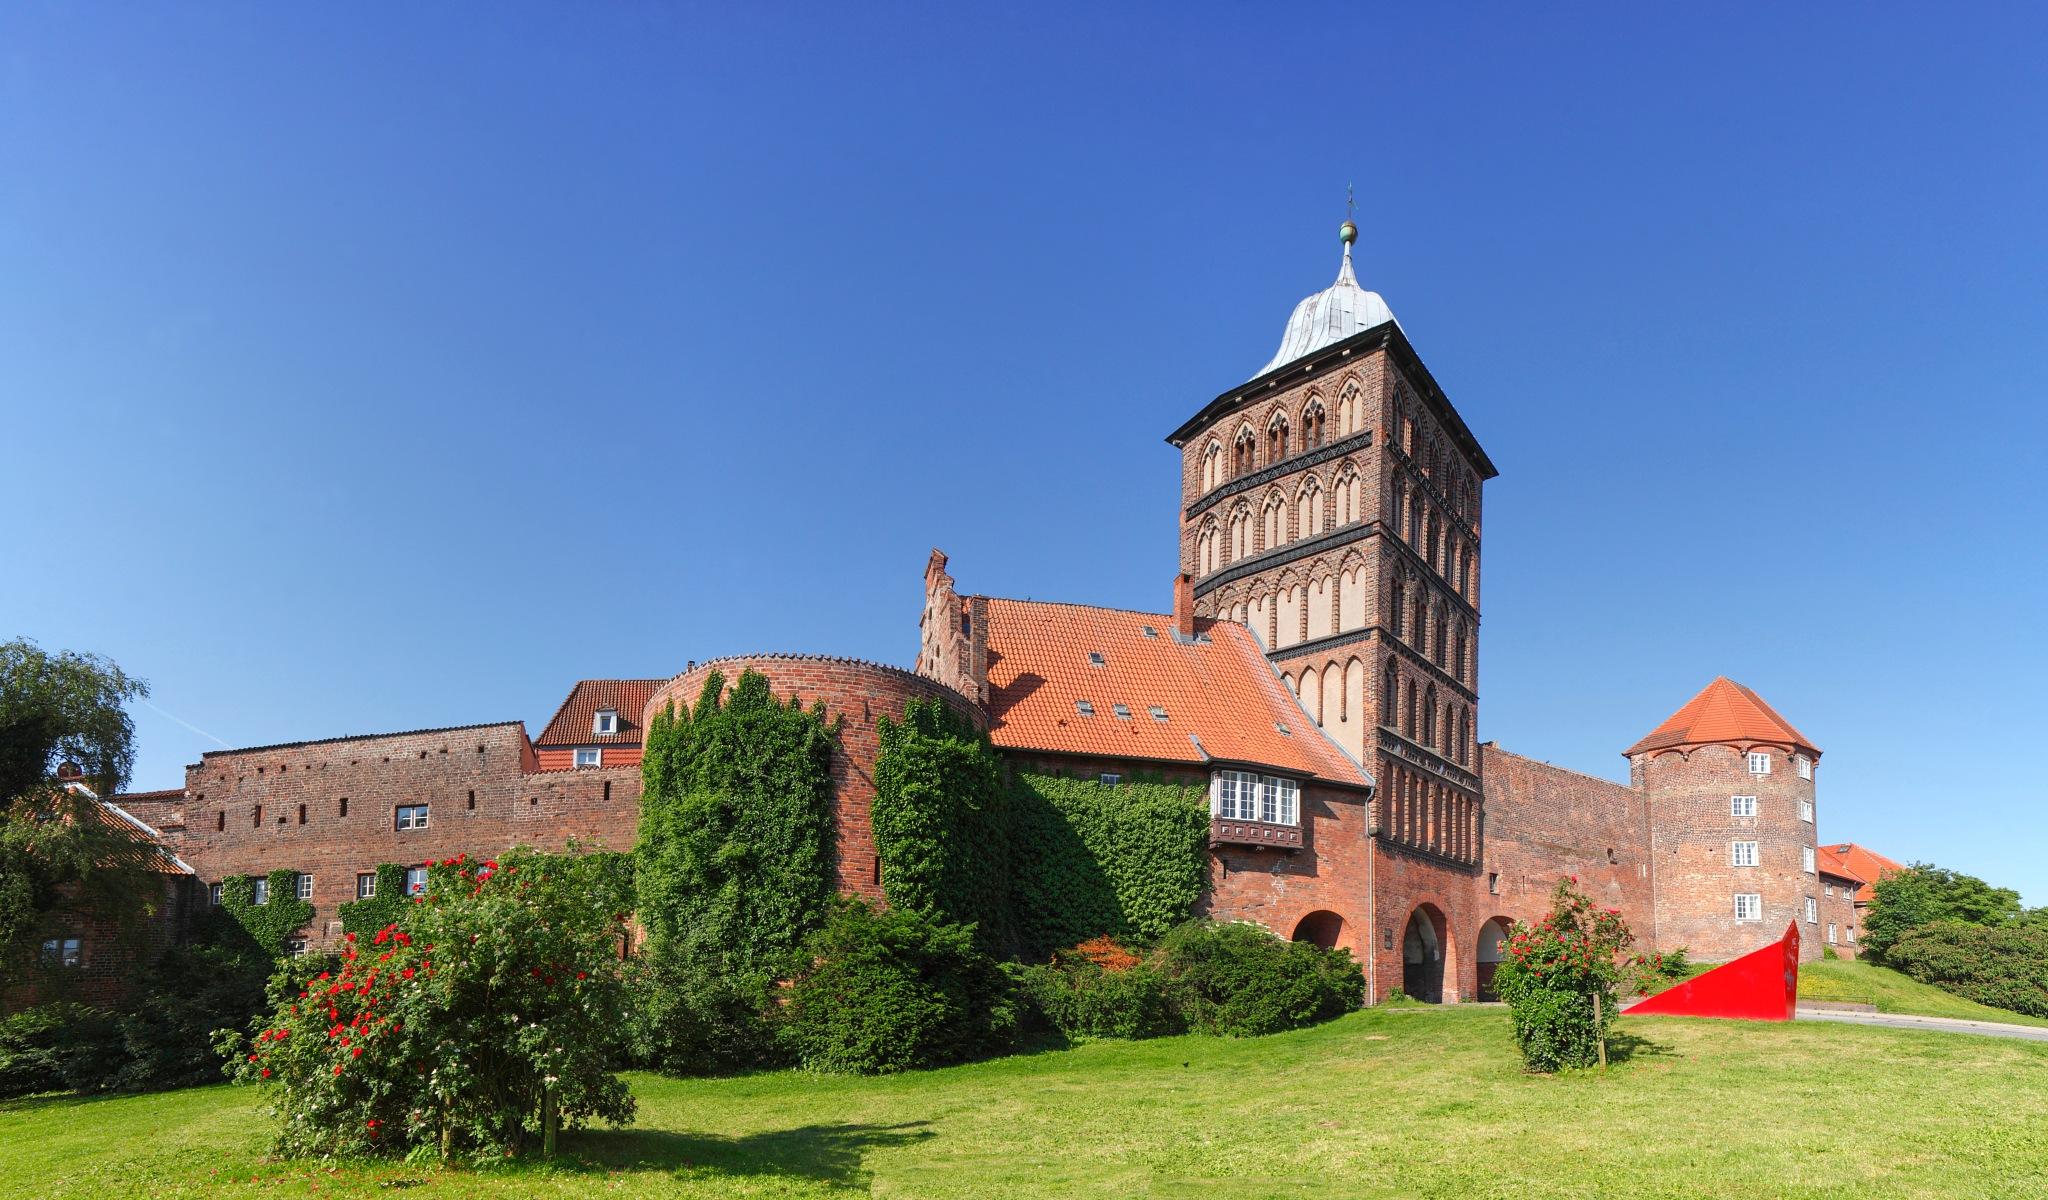 Burgtor, Luebeck by Torsten Krüger